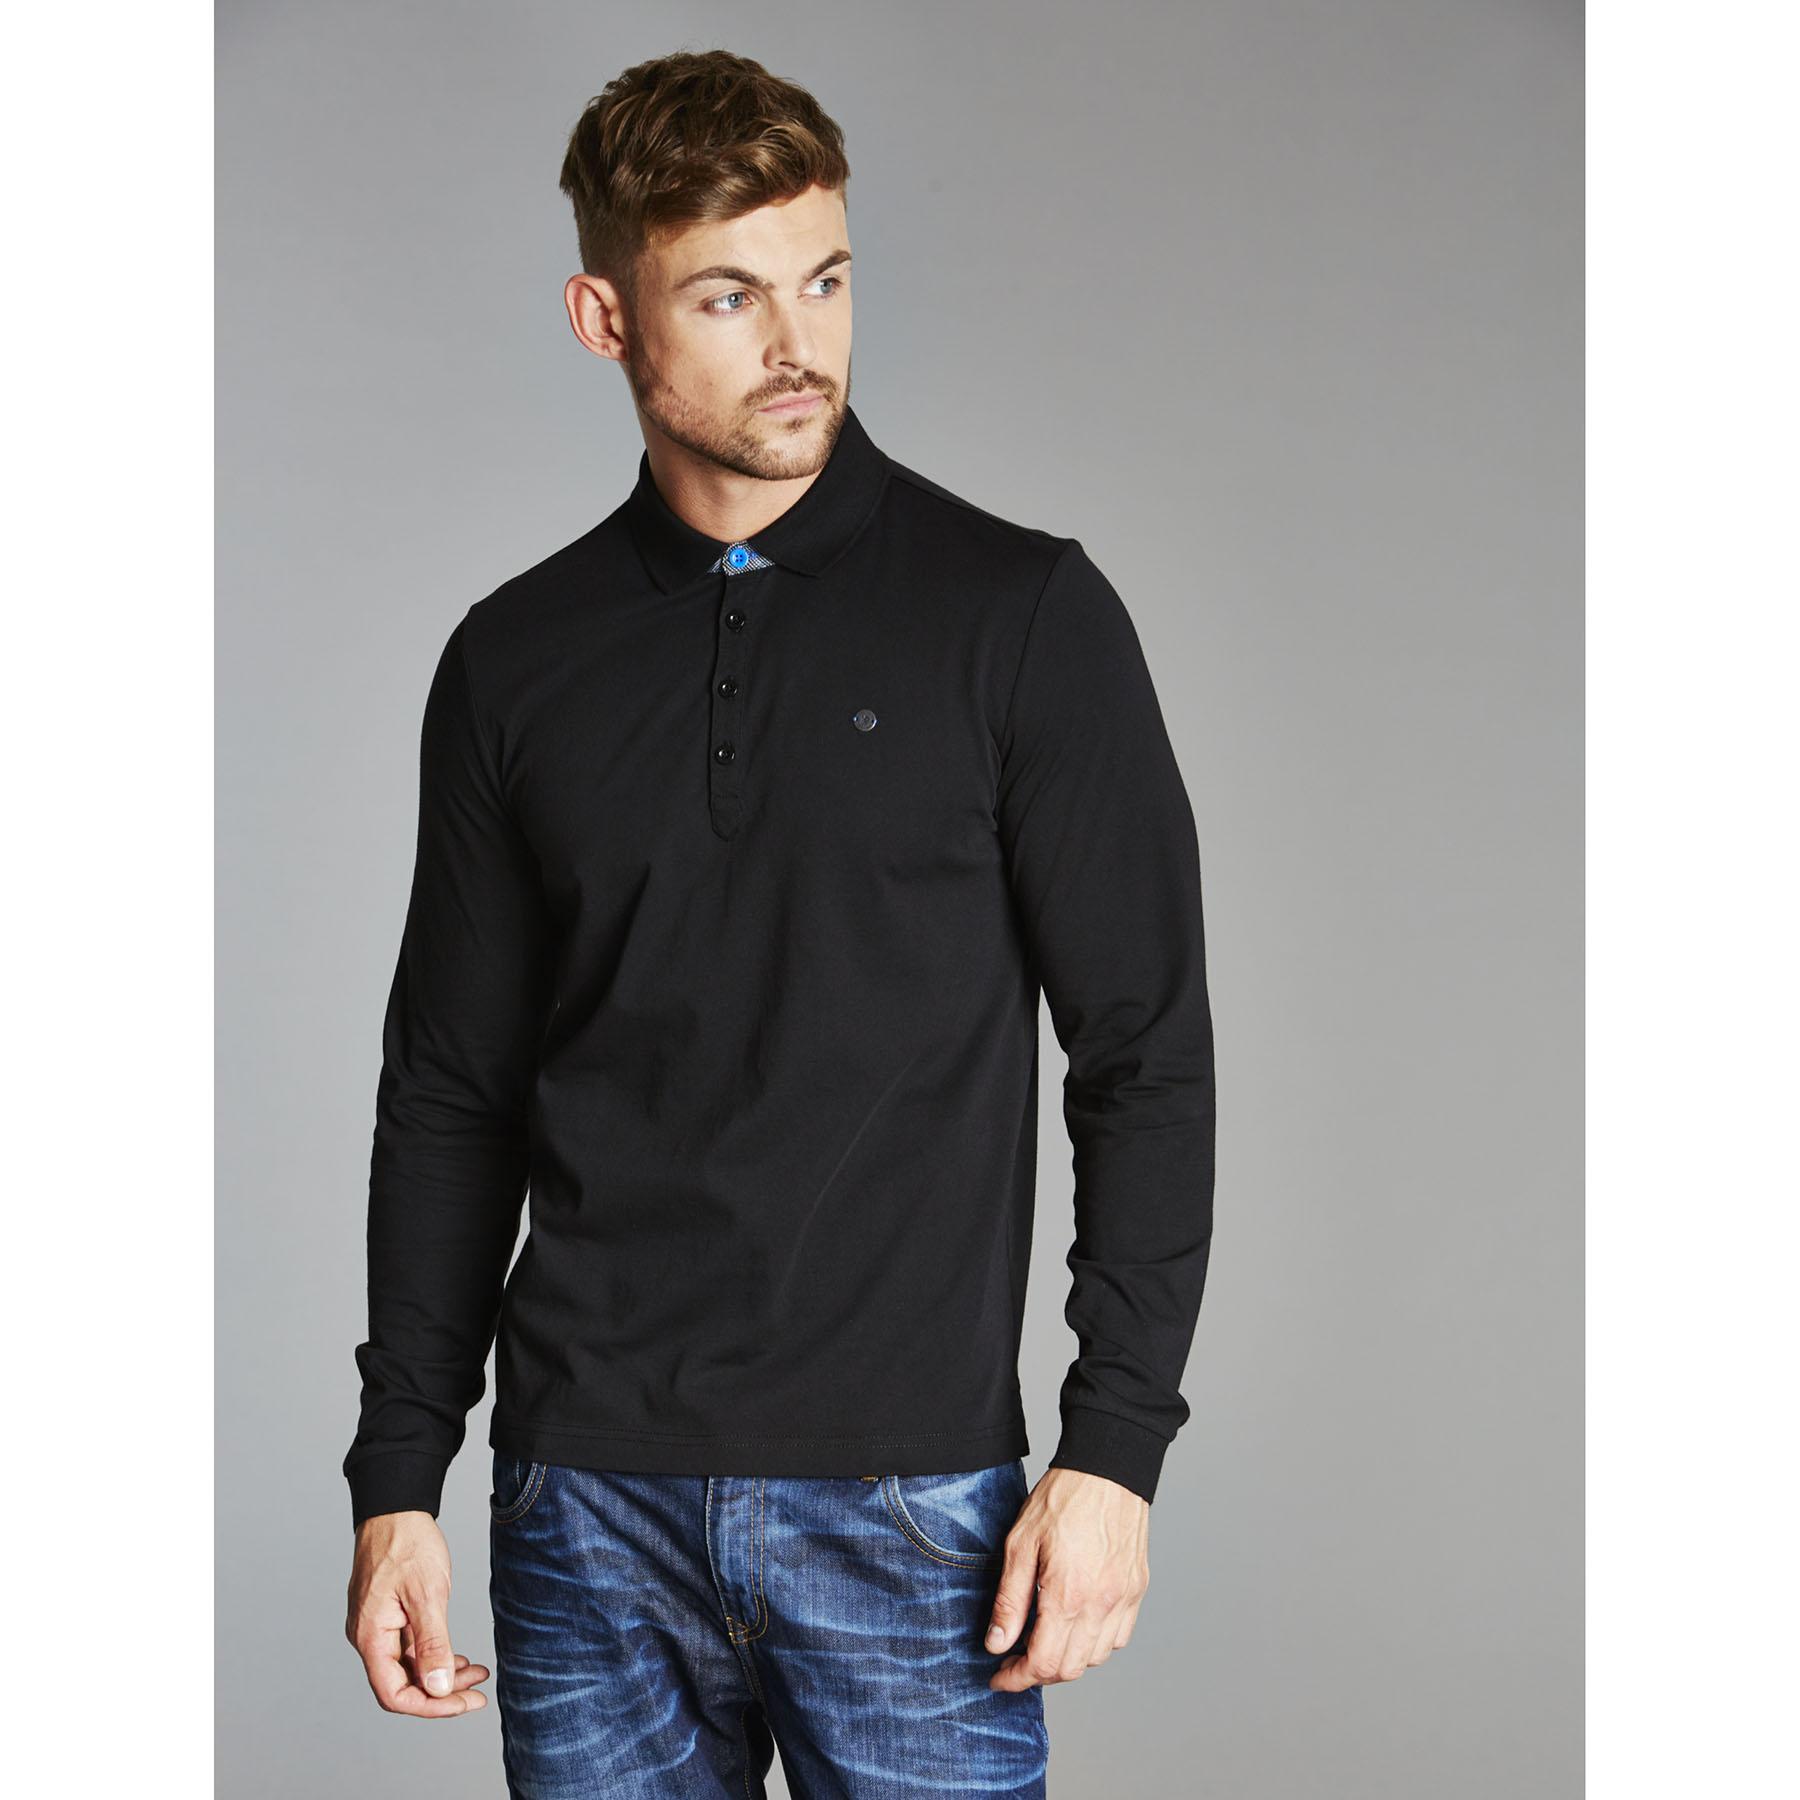 Chelsea Collection Long Sleeve Polo Shirt - Black - Mens